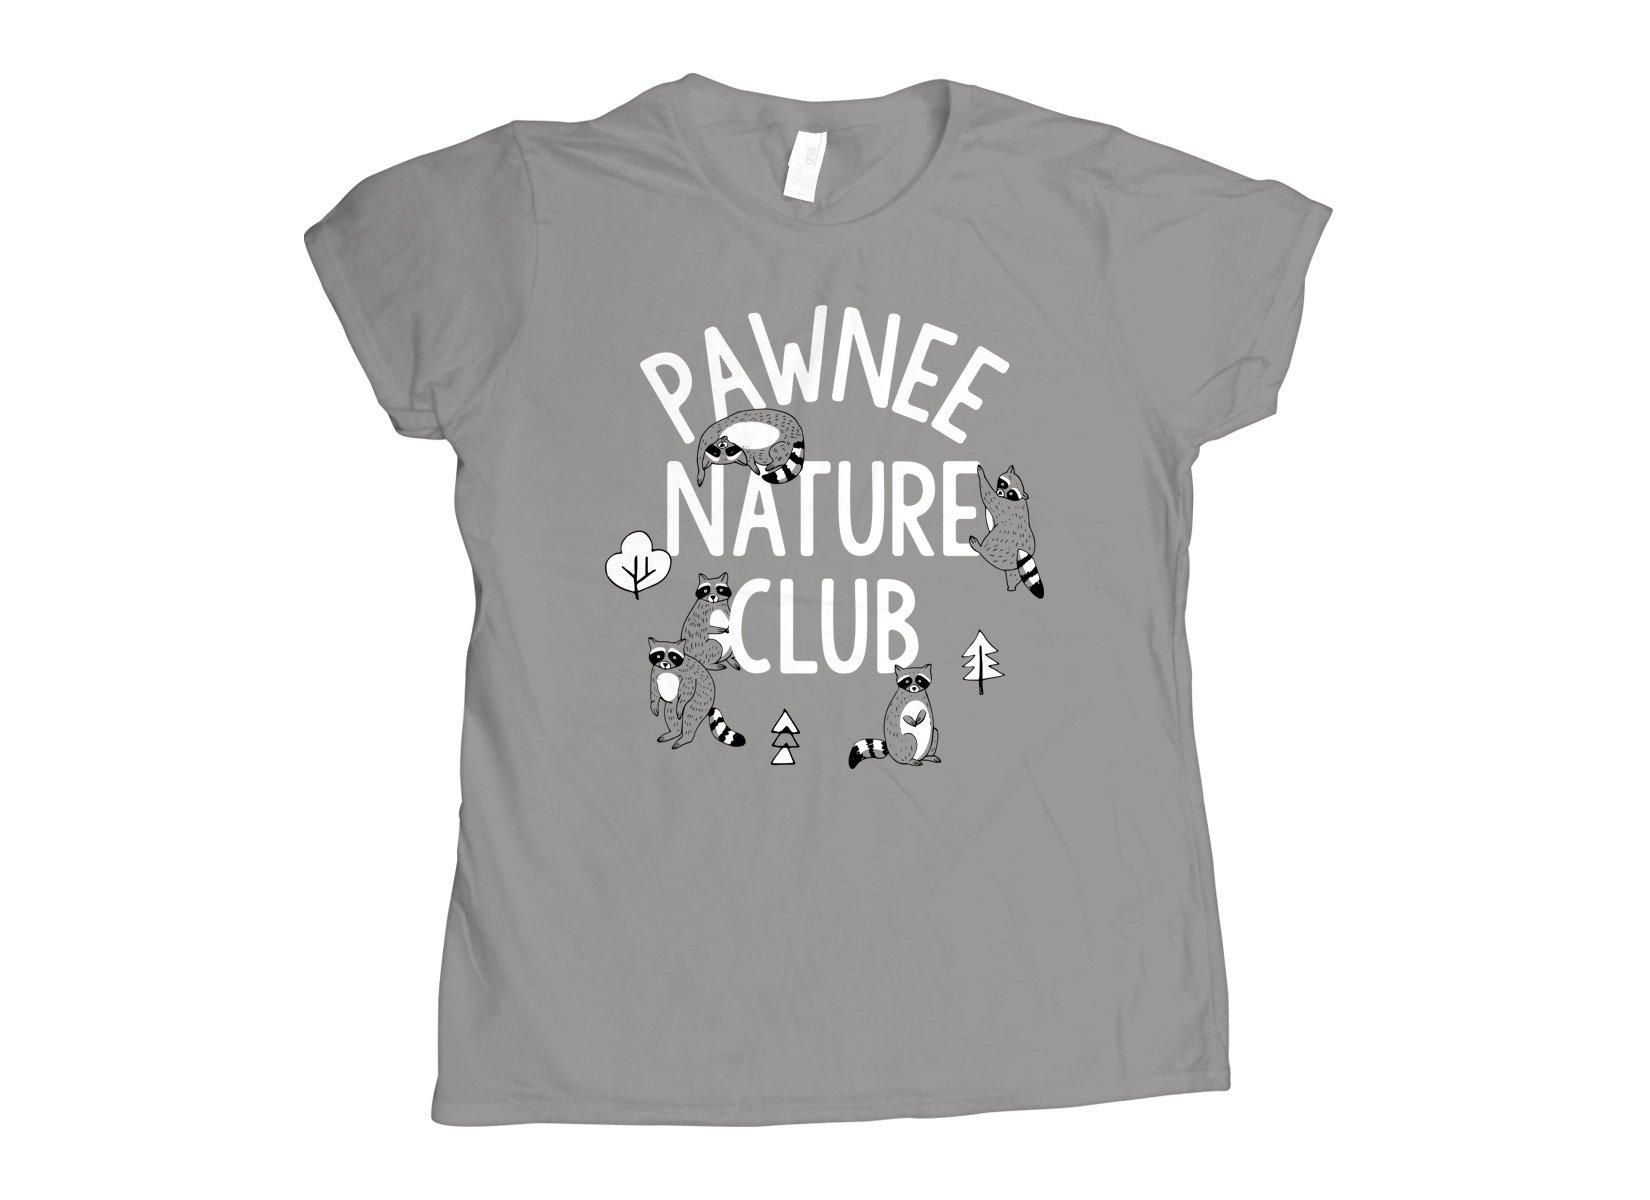 Pawnee Nature Club on Womens T-Shirt